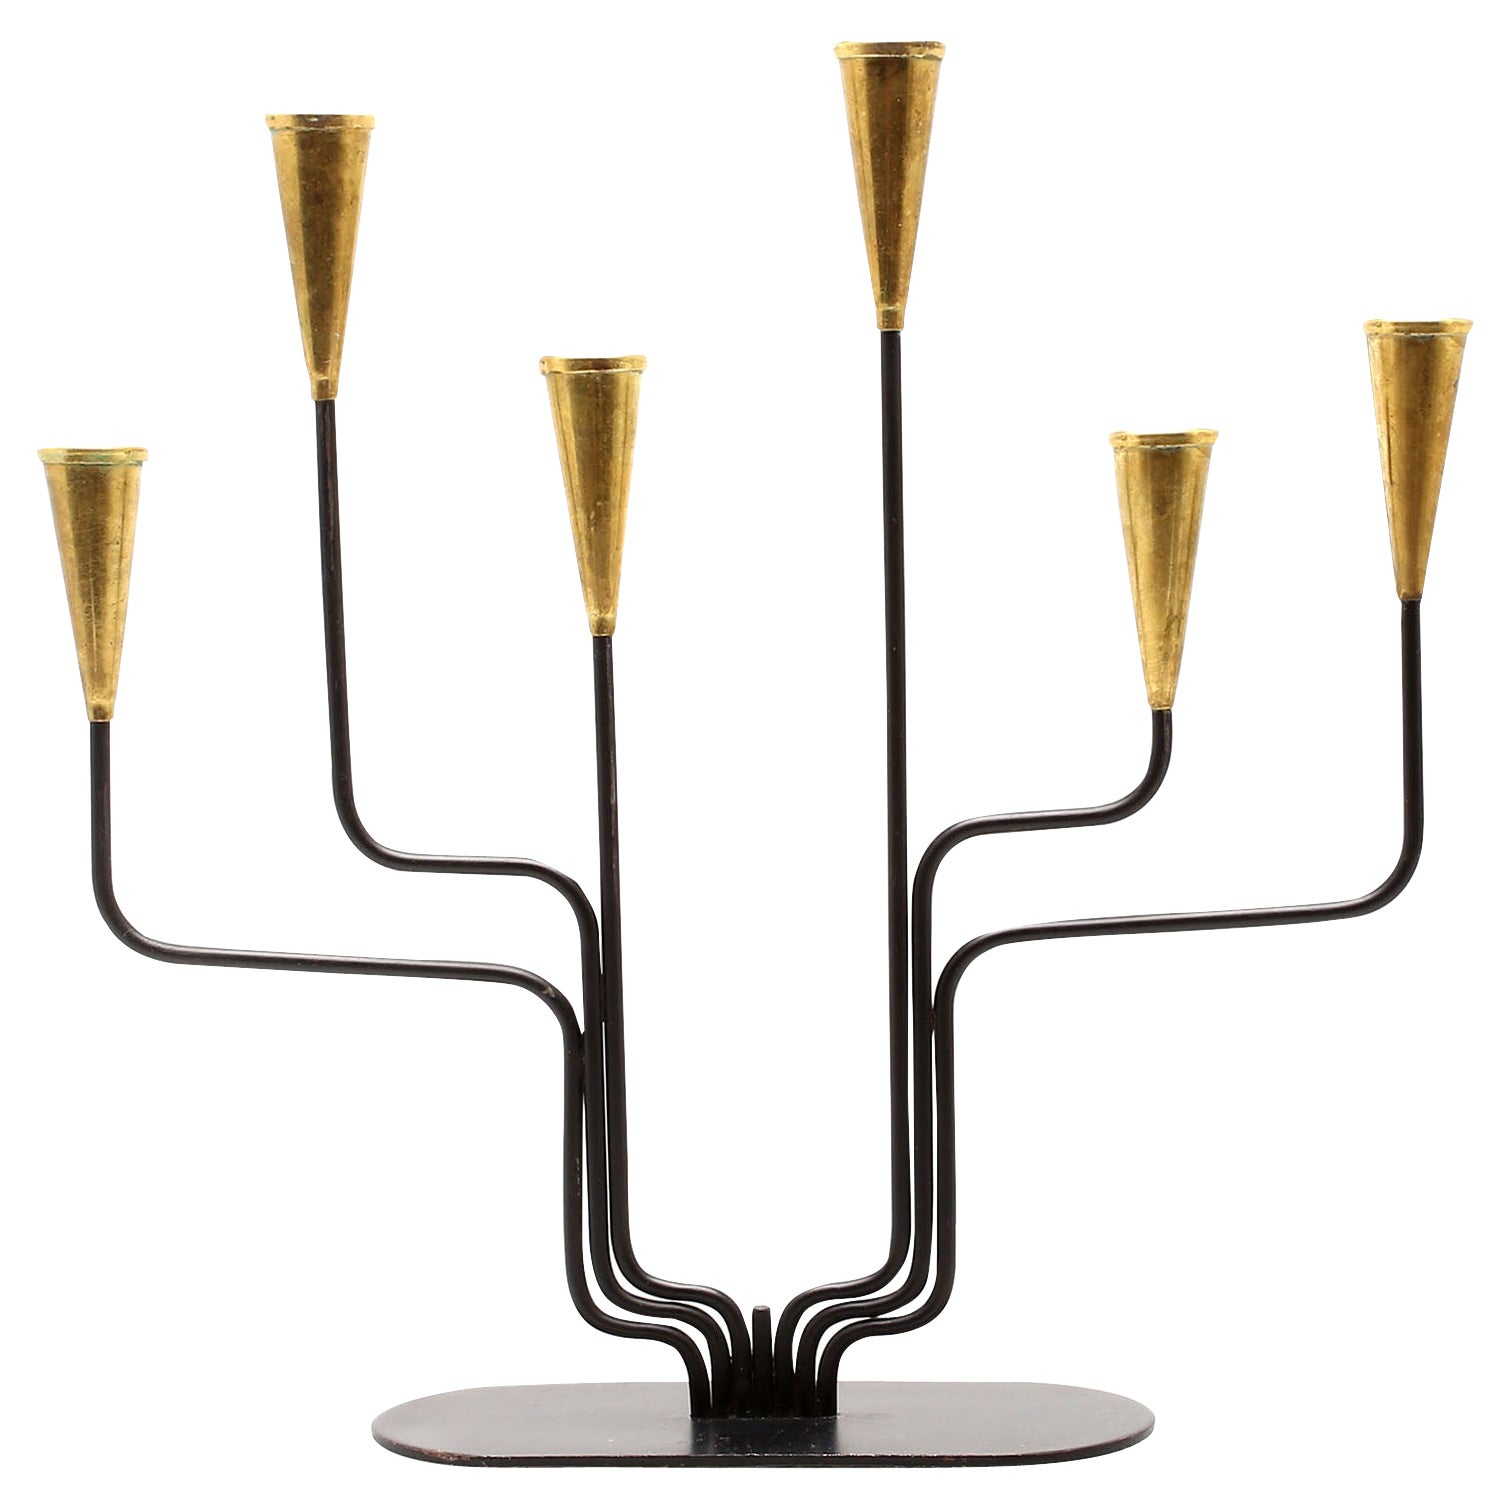 Candleholder by Gunnar Ander for Ystad Metall, Sweden